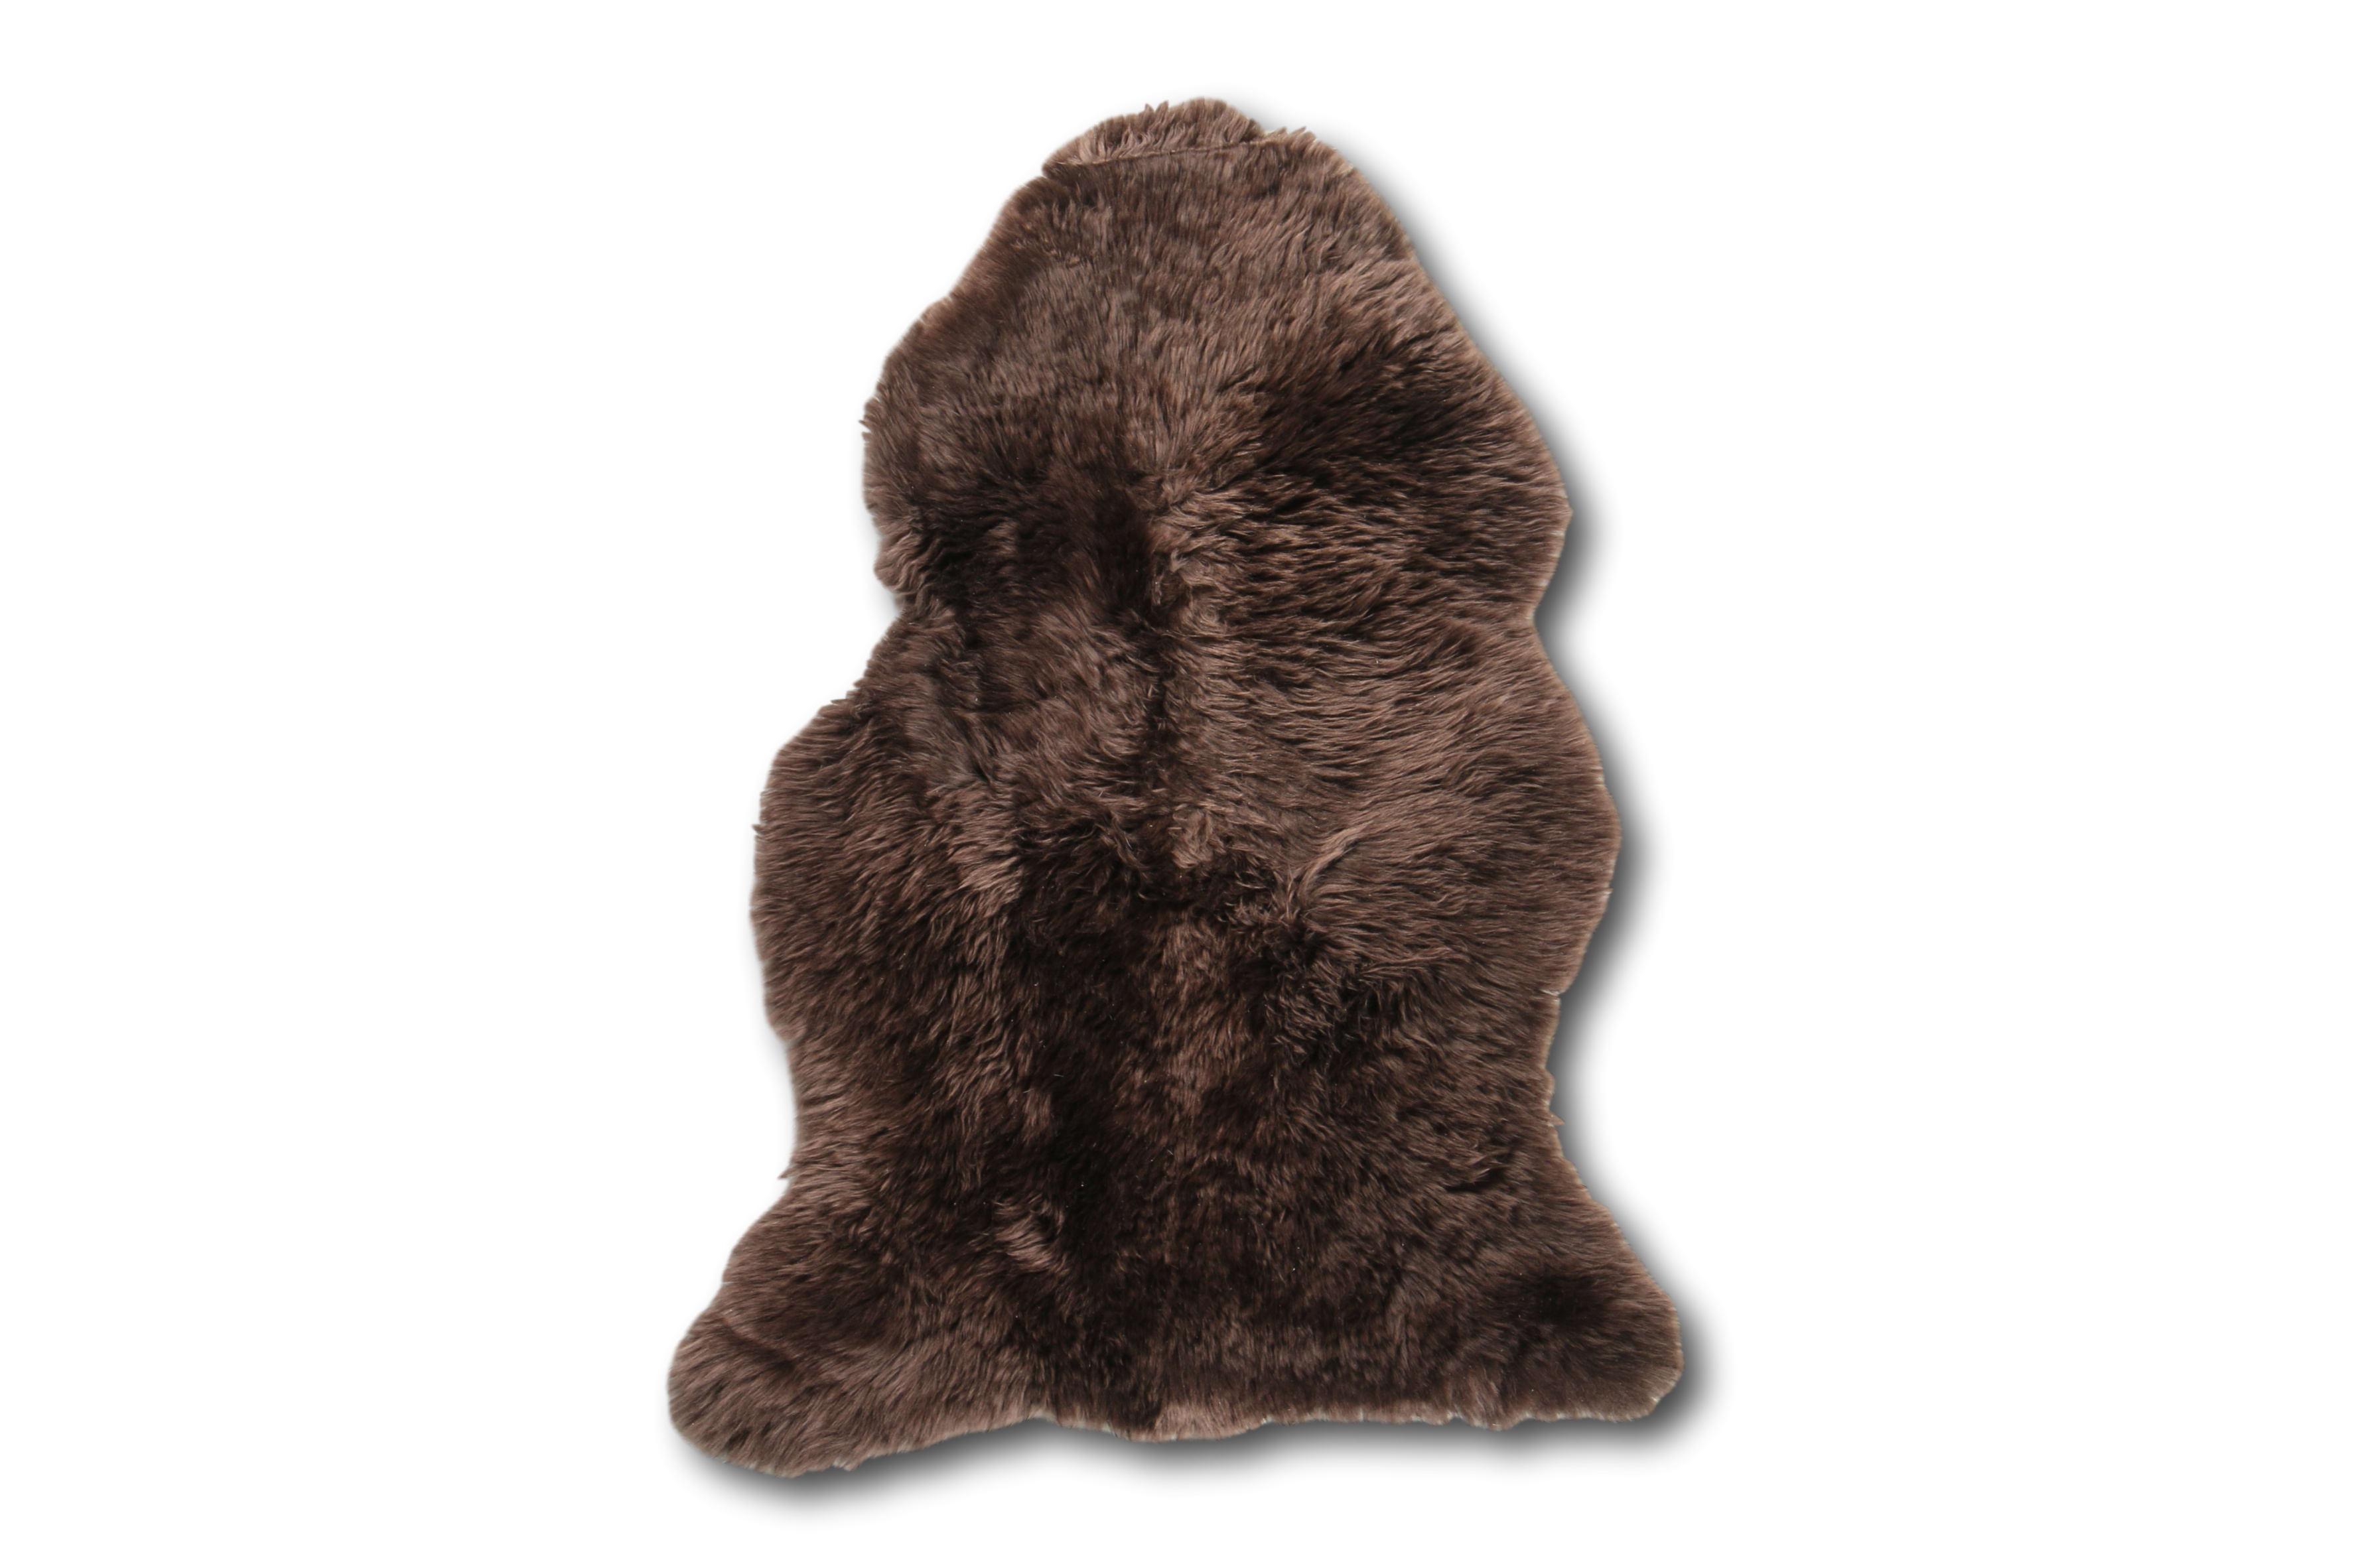 Esbeco Tapis en peau de mouton marron 70x100